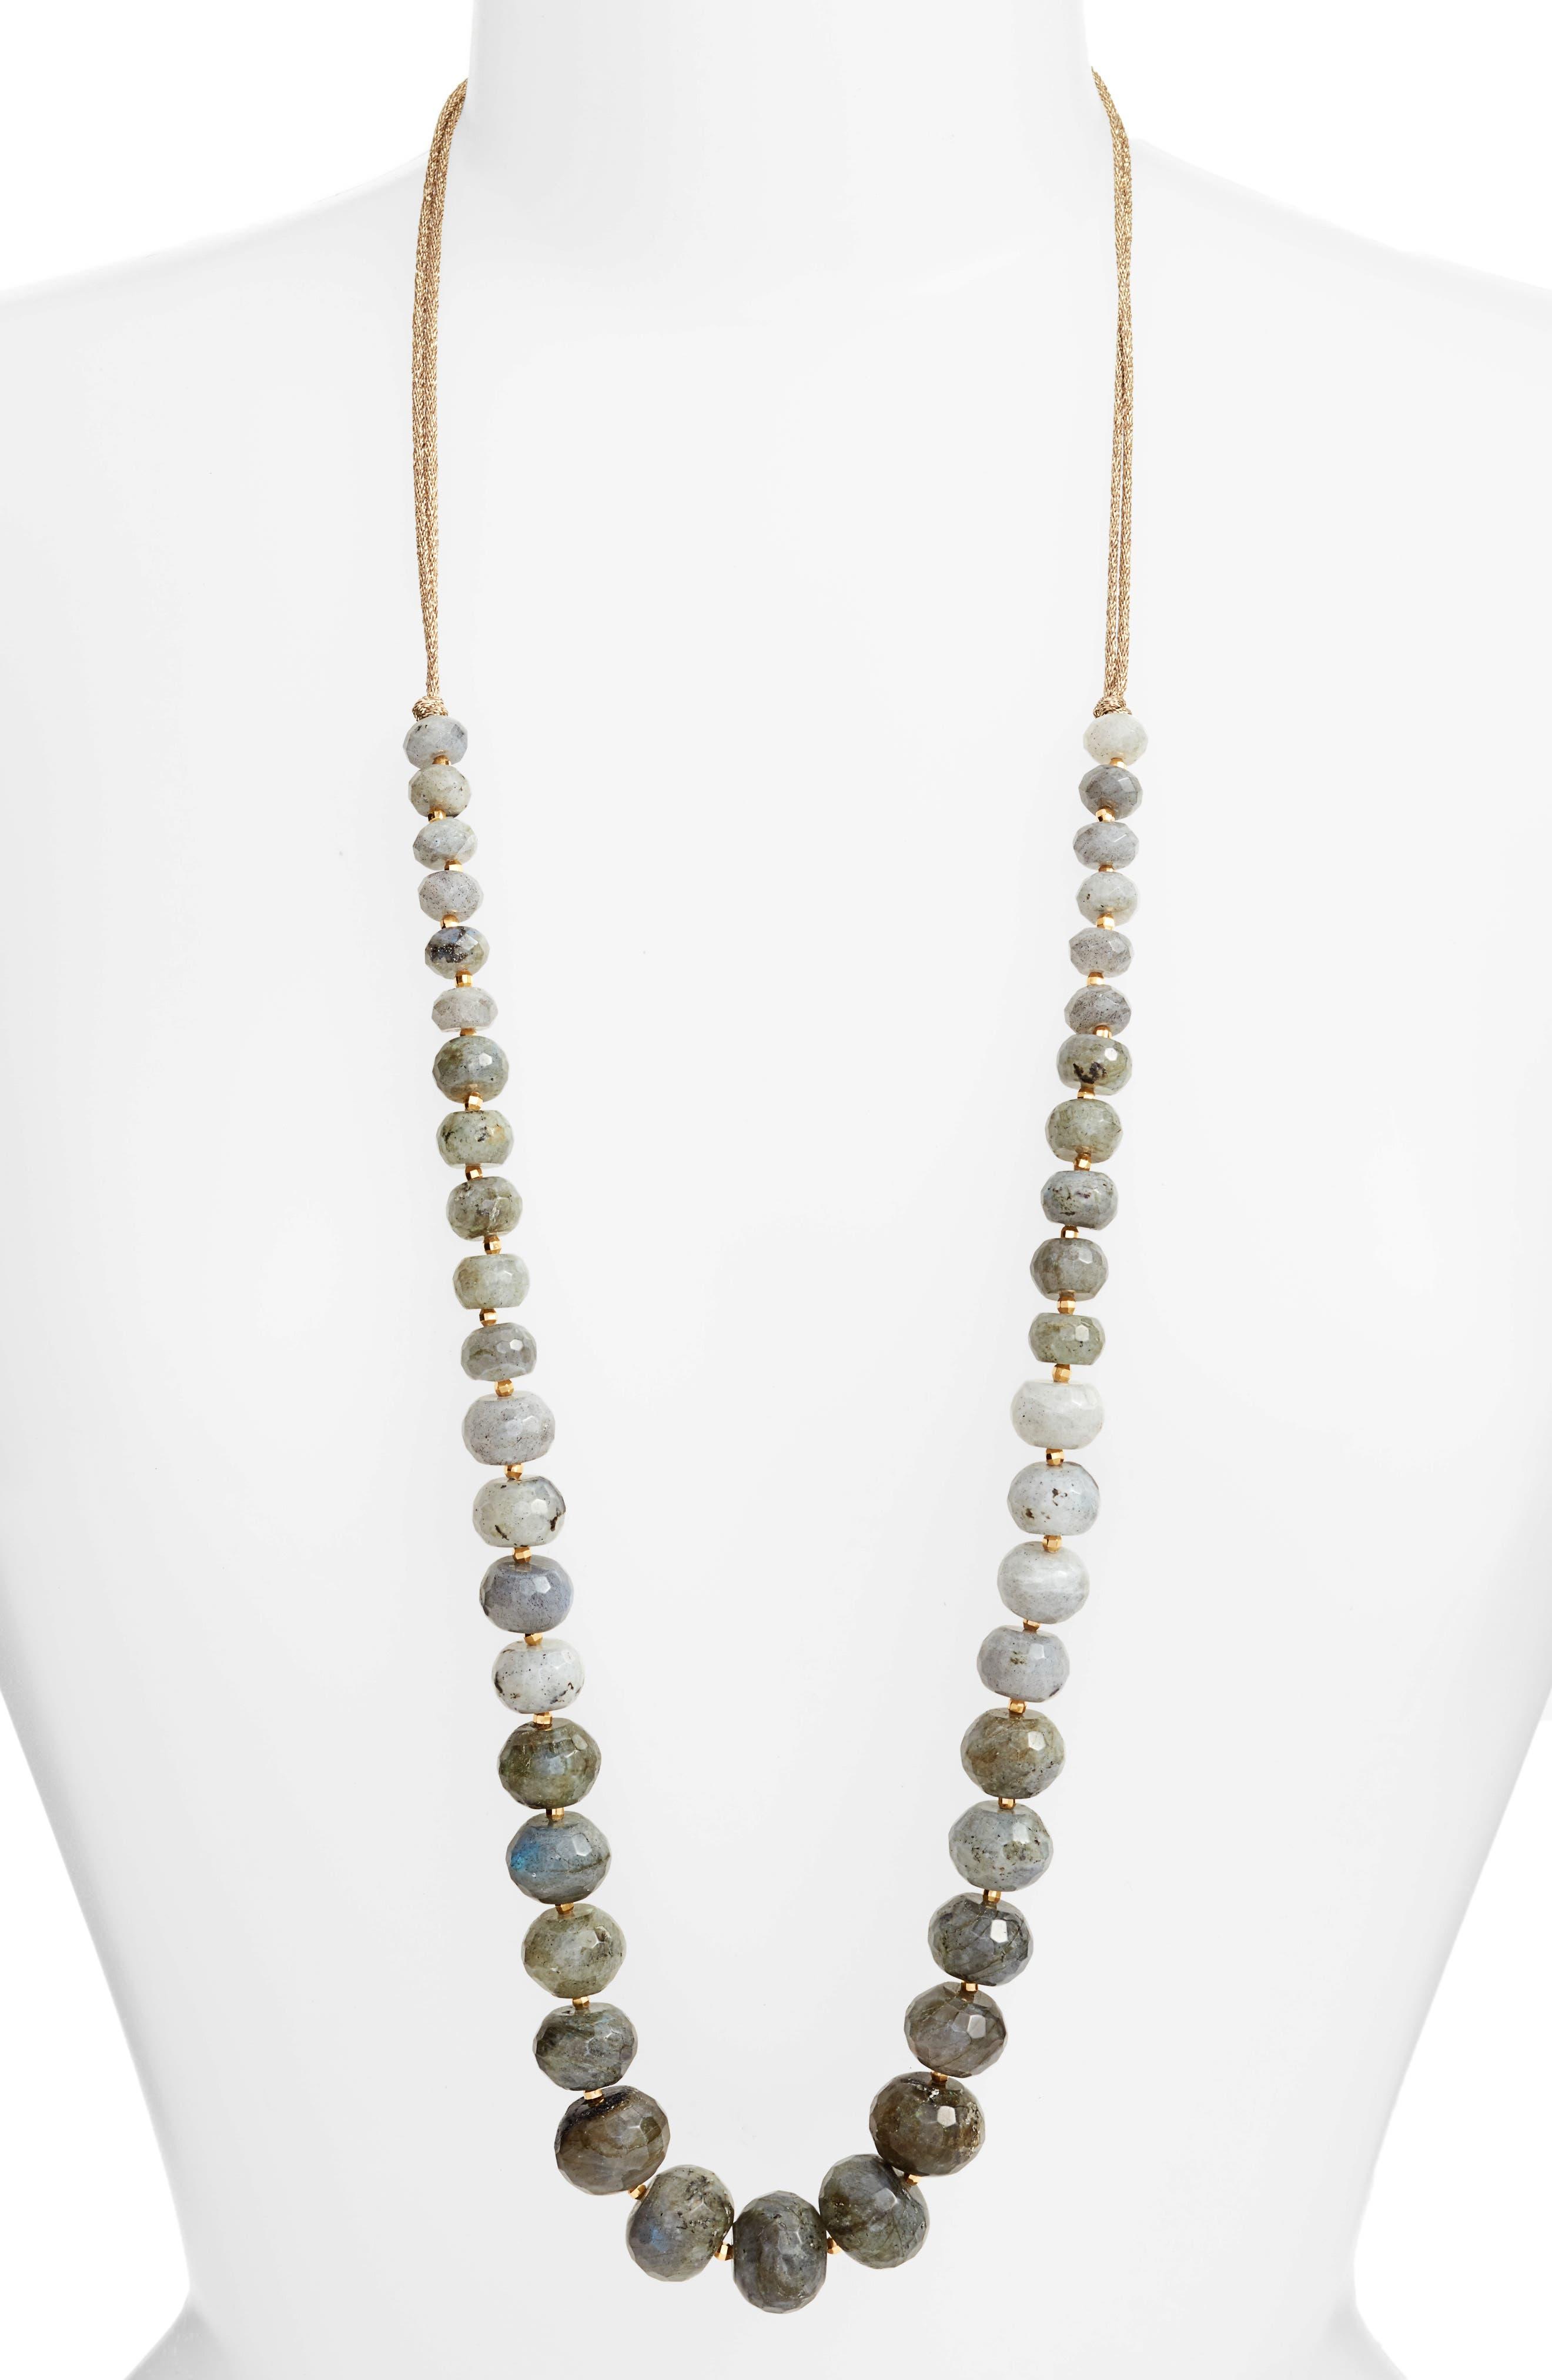 Graduated Semiprecious Stone Necklace,                             Main thumbnail 1, color,                             020